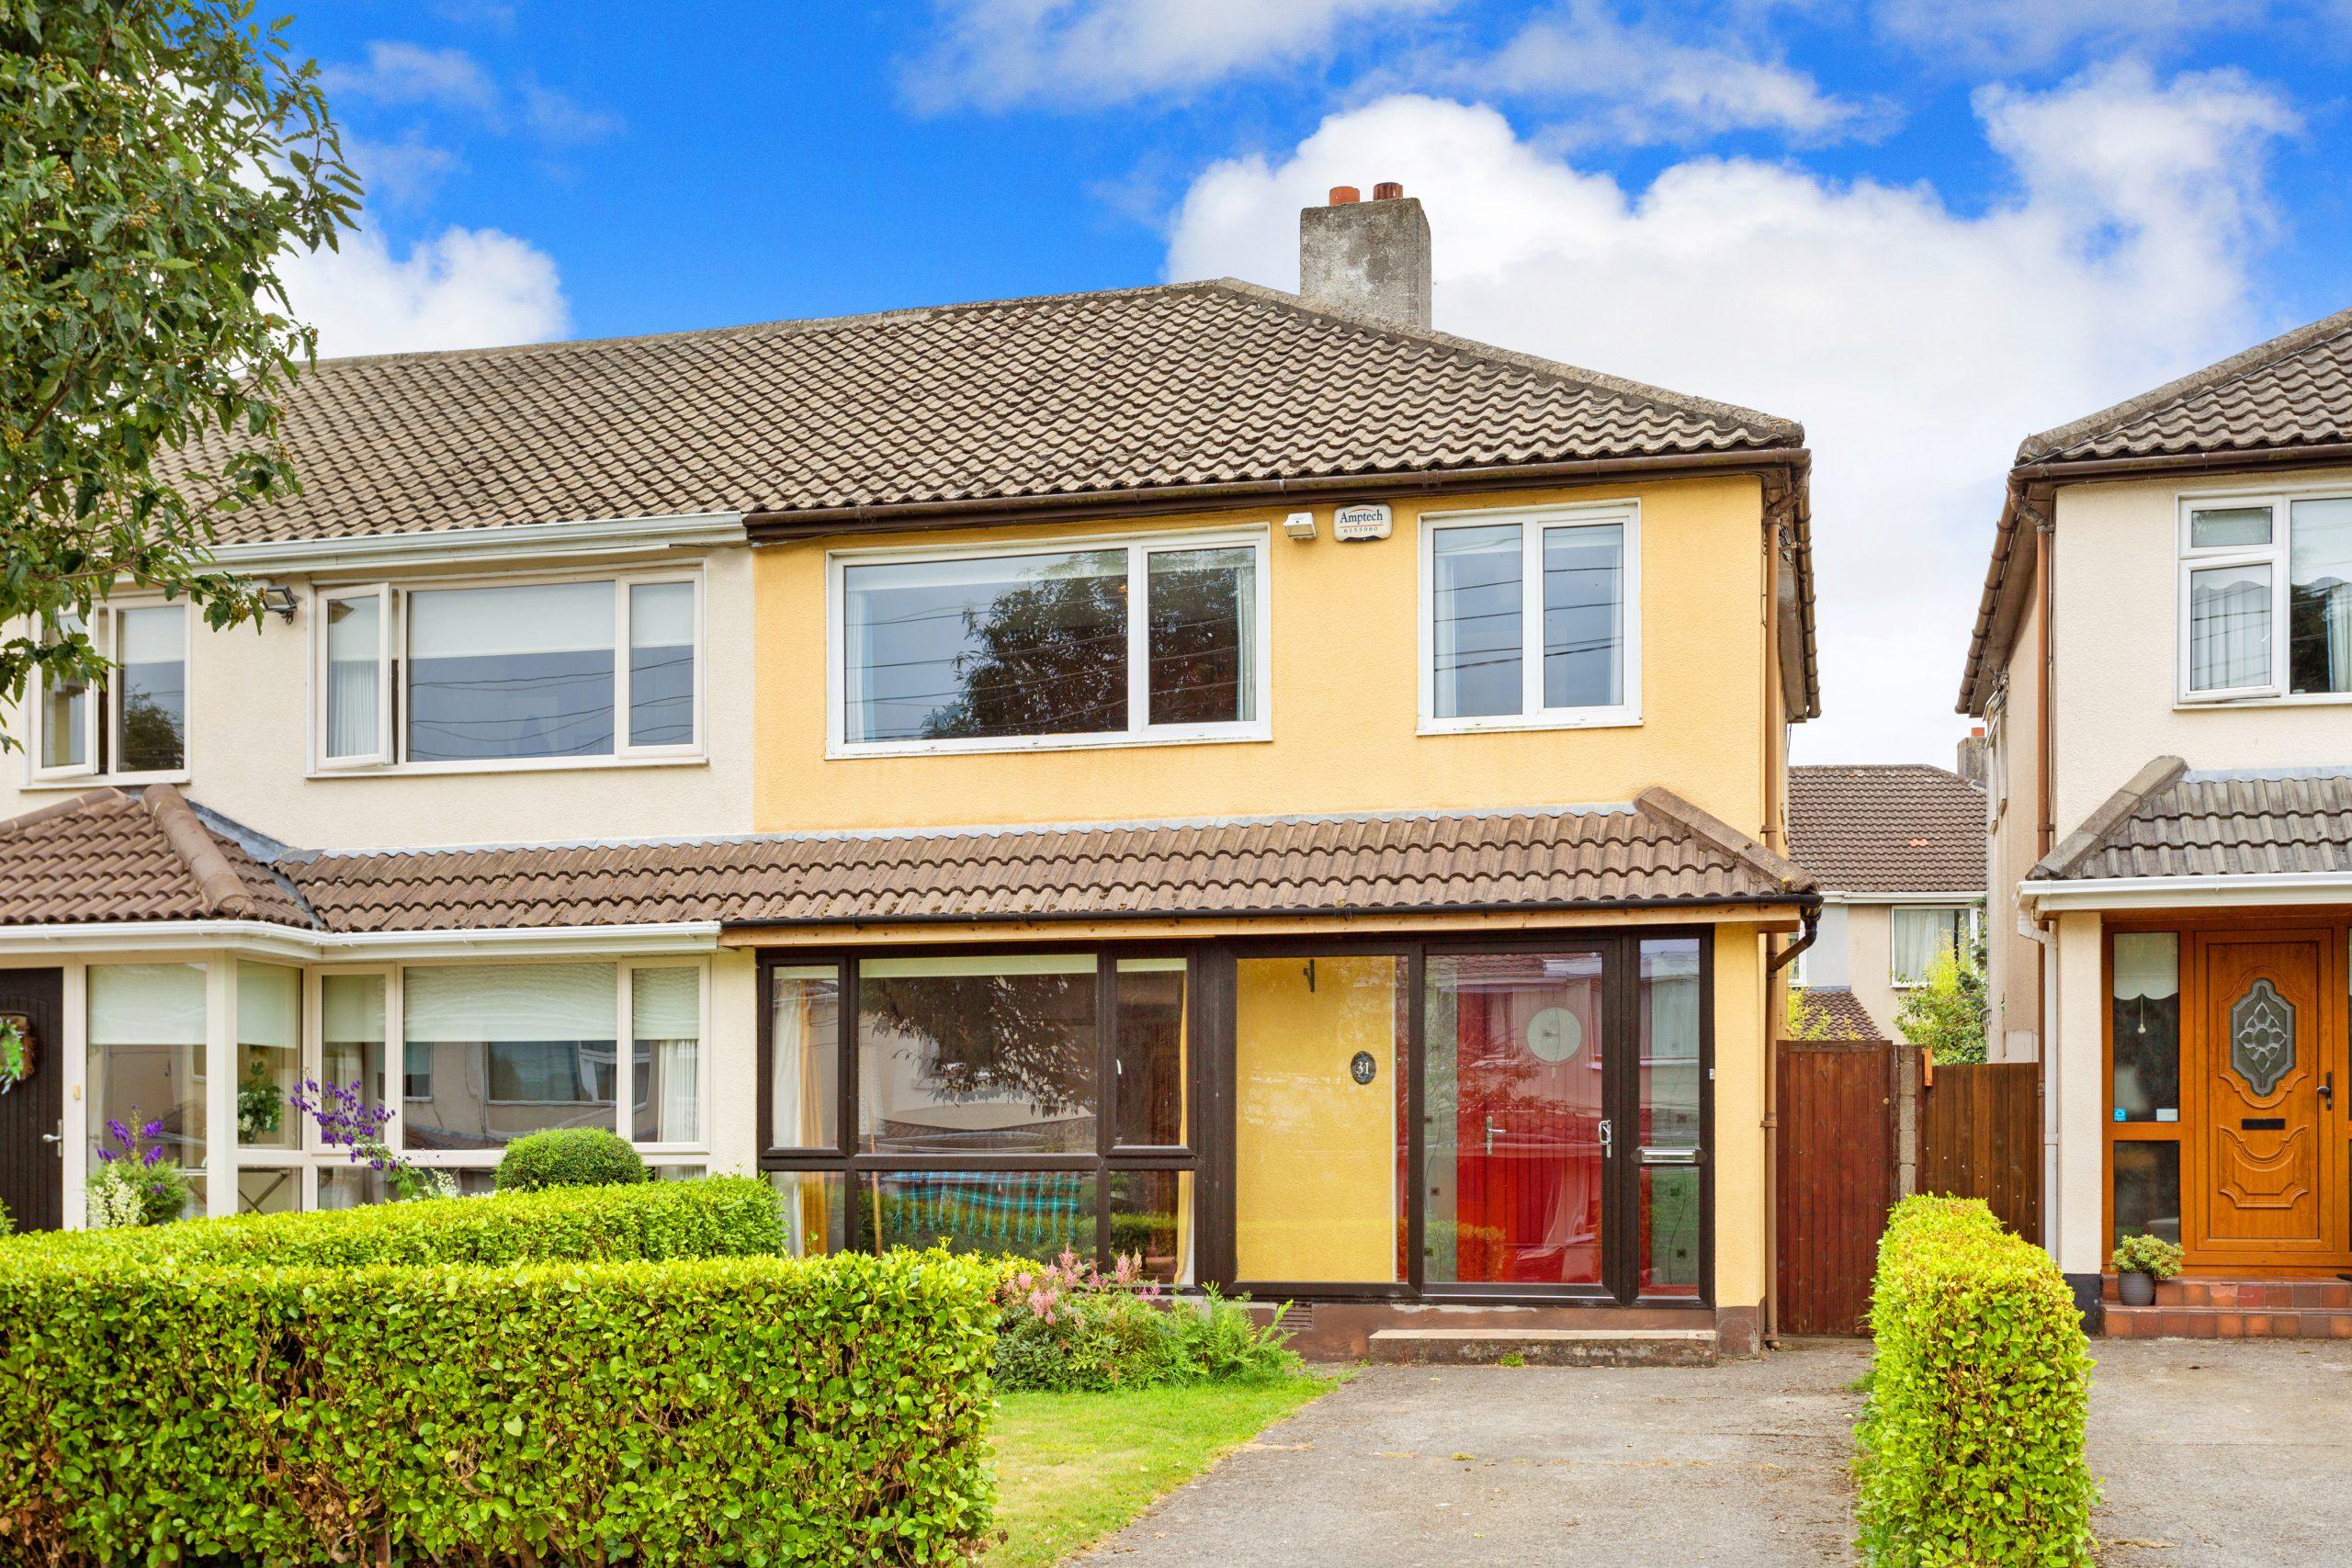 31 The Green, Woodpark, Ballinteer, Dublin 16